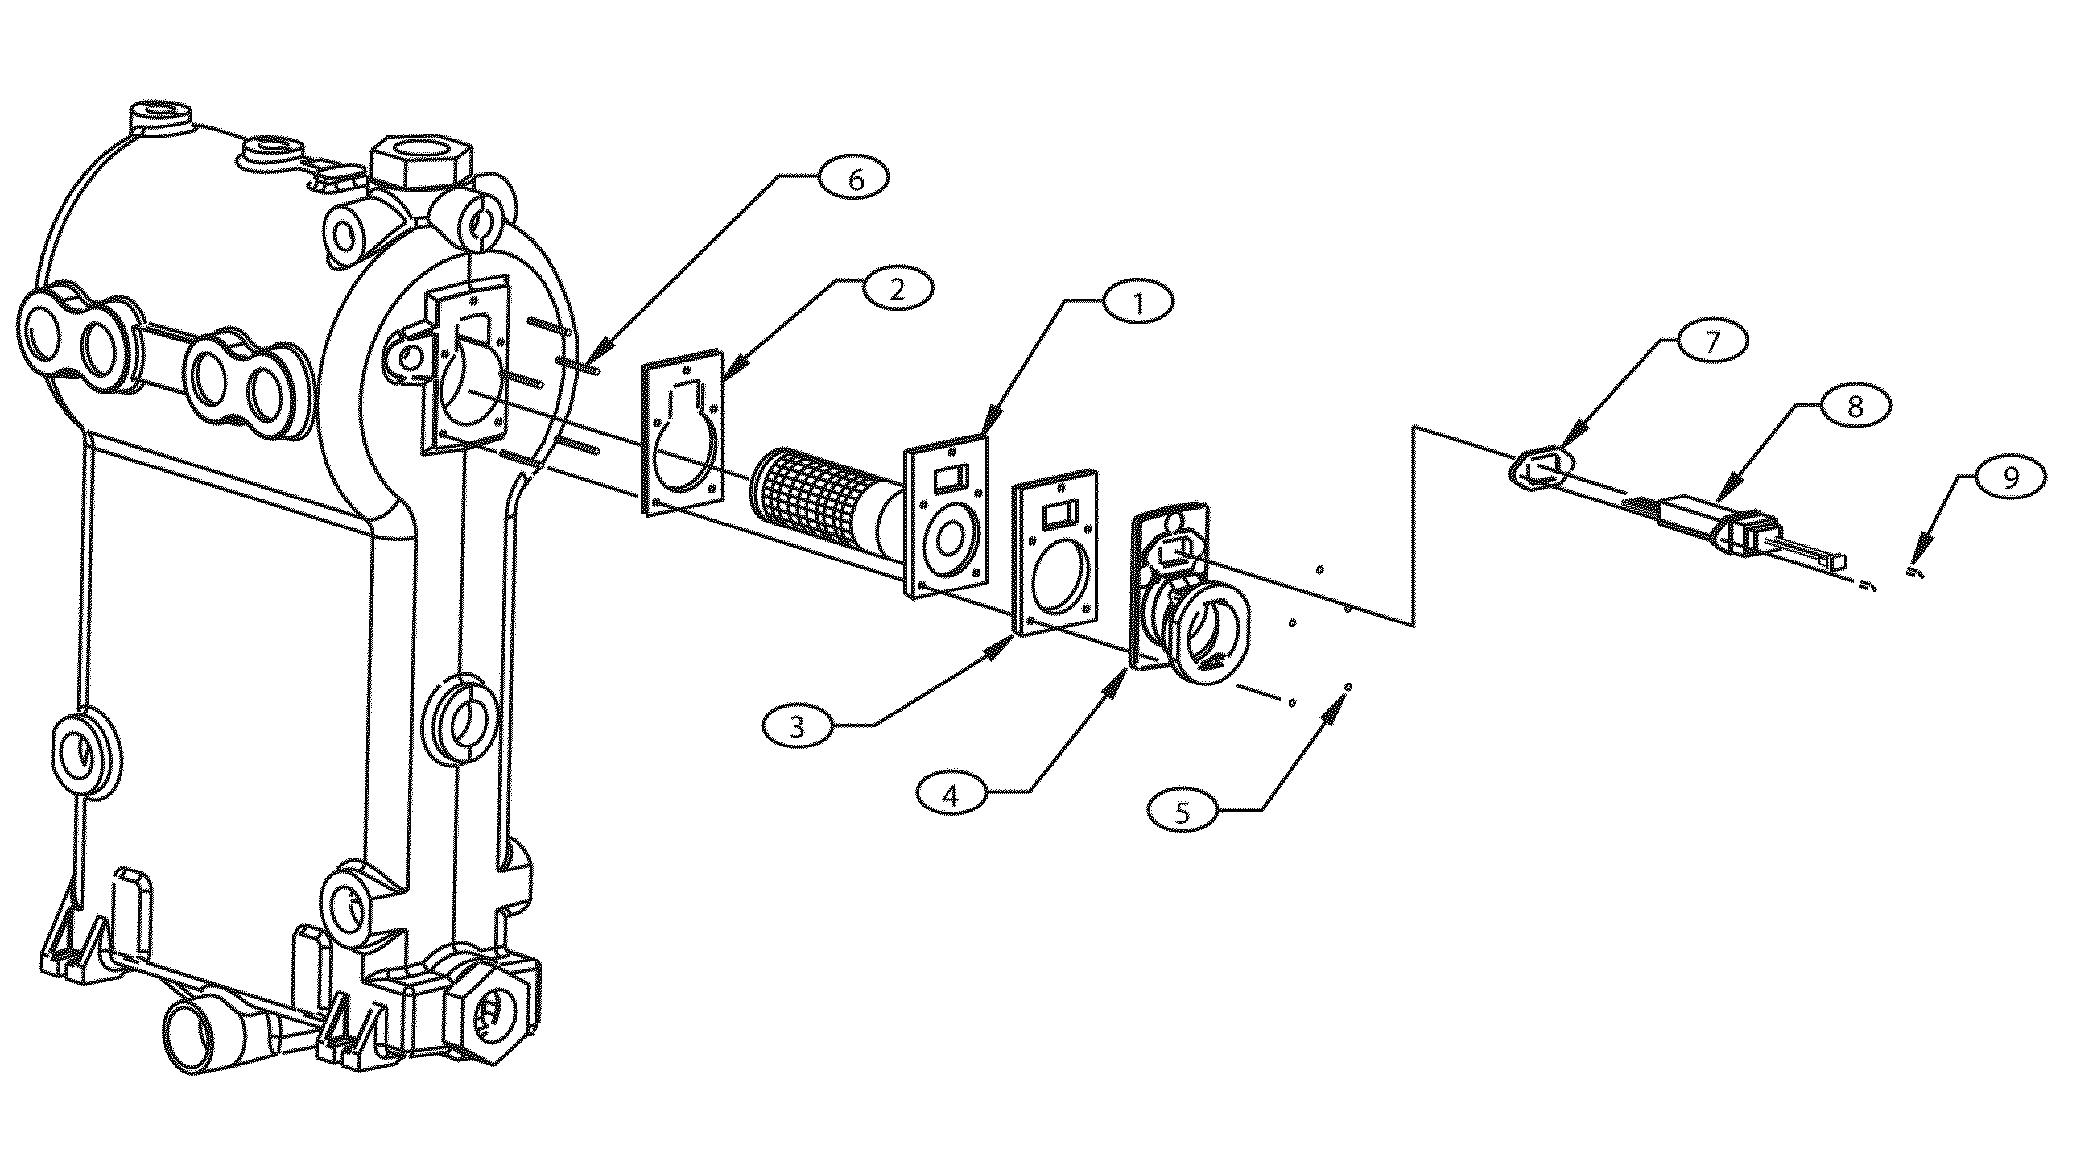 Dunkirk model Q90-200 SERIES 2 boiler-storage tanks